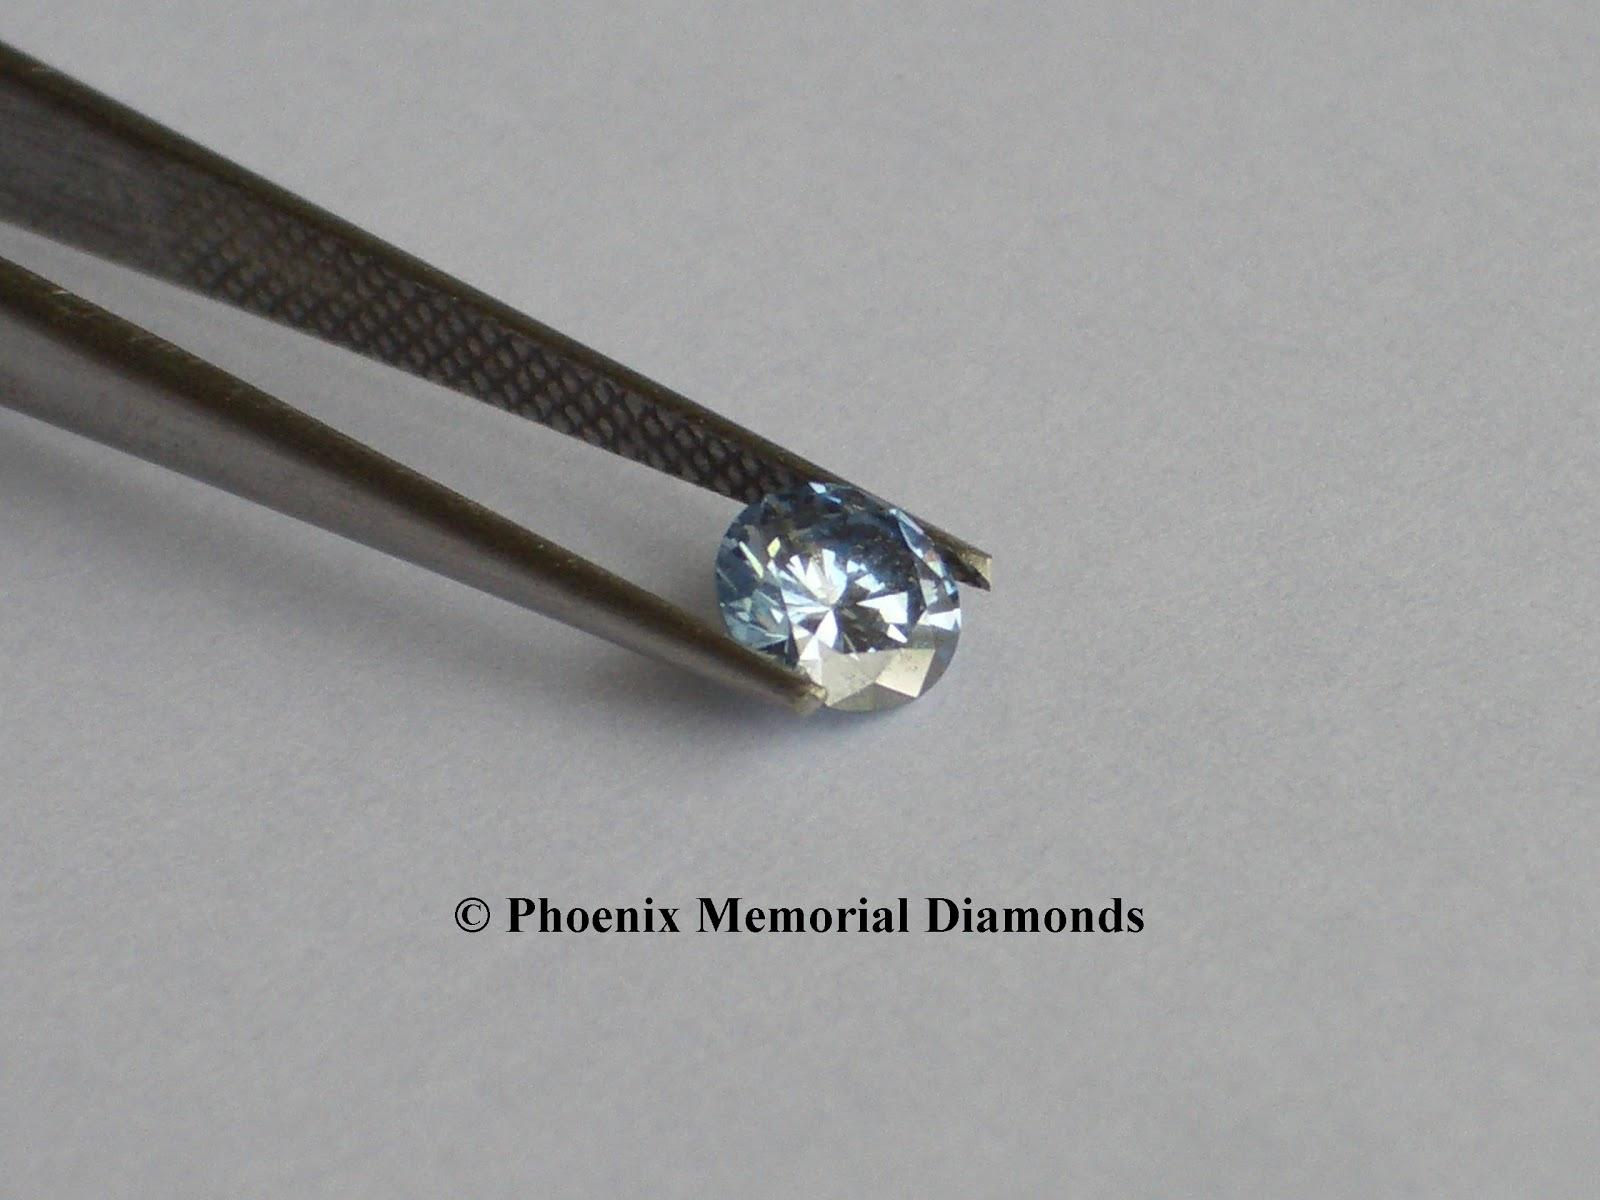 New Developments from Phoenix Memorial Diamonds